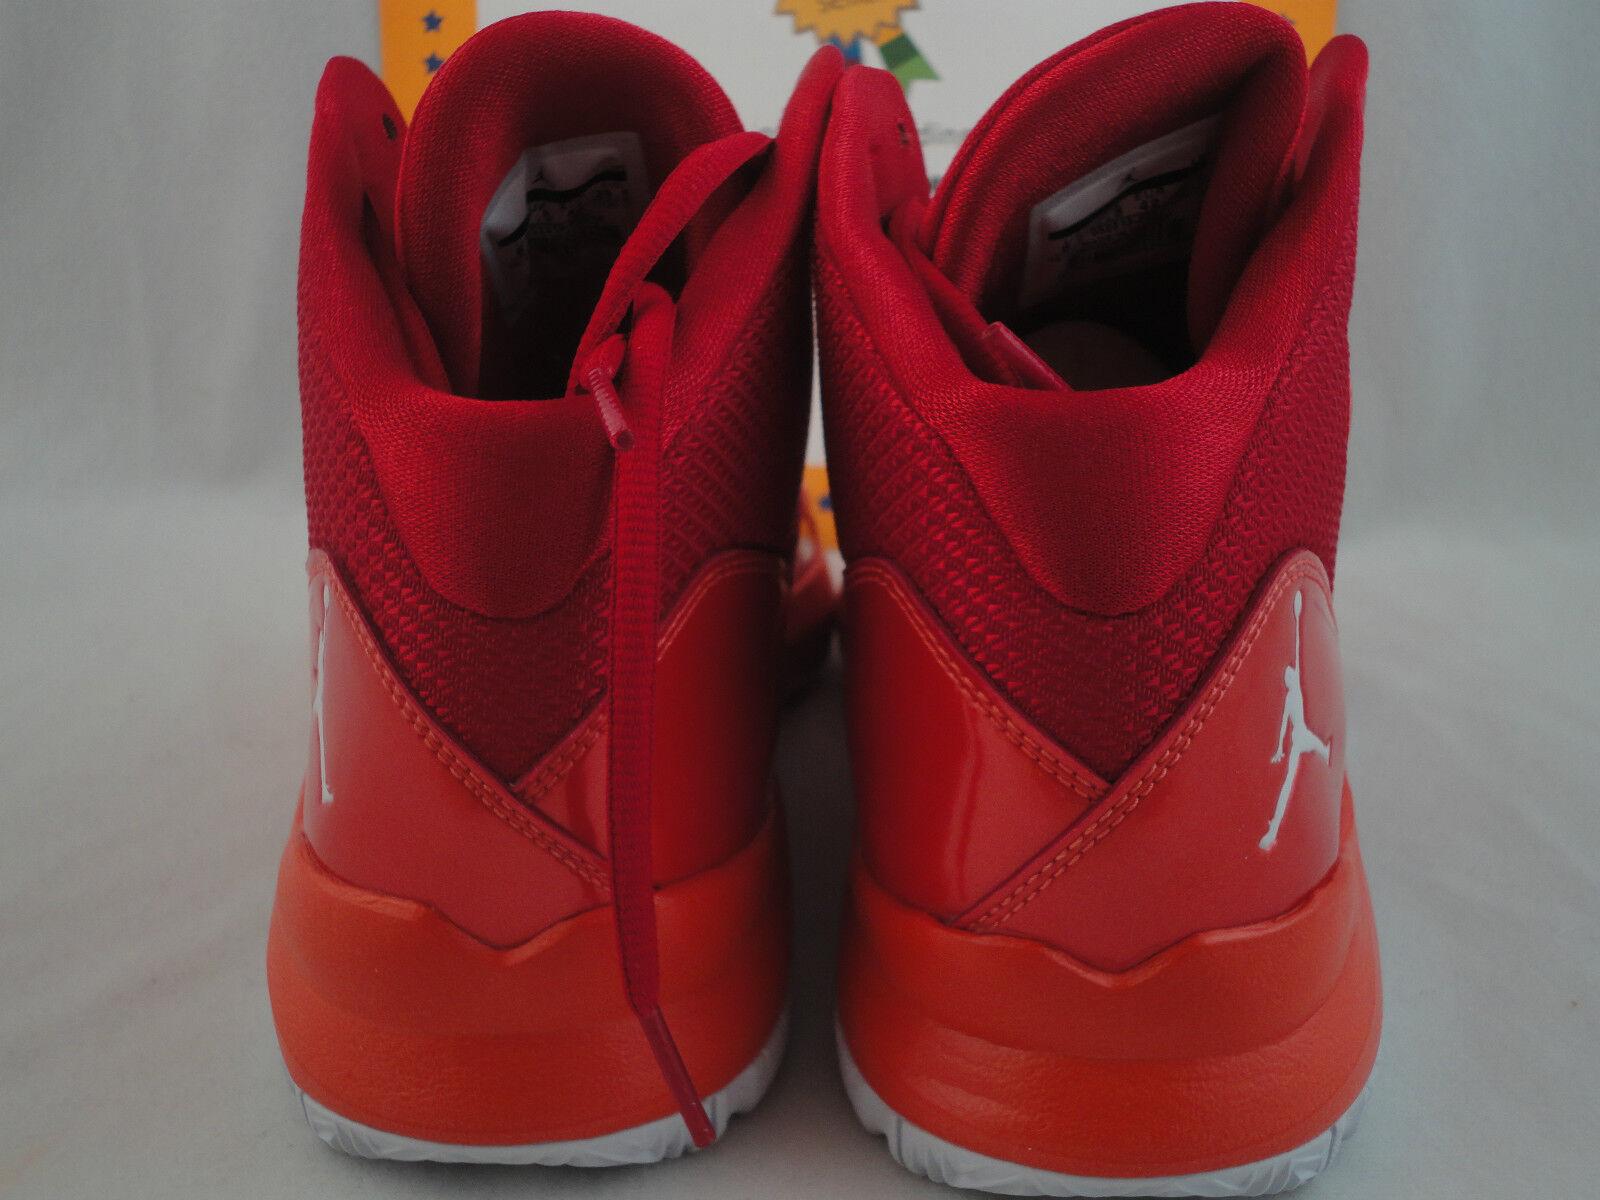 Nike Jordan Aero Mania, Size 11, Flywire, Gym Red Orange, Retail 120